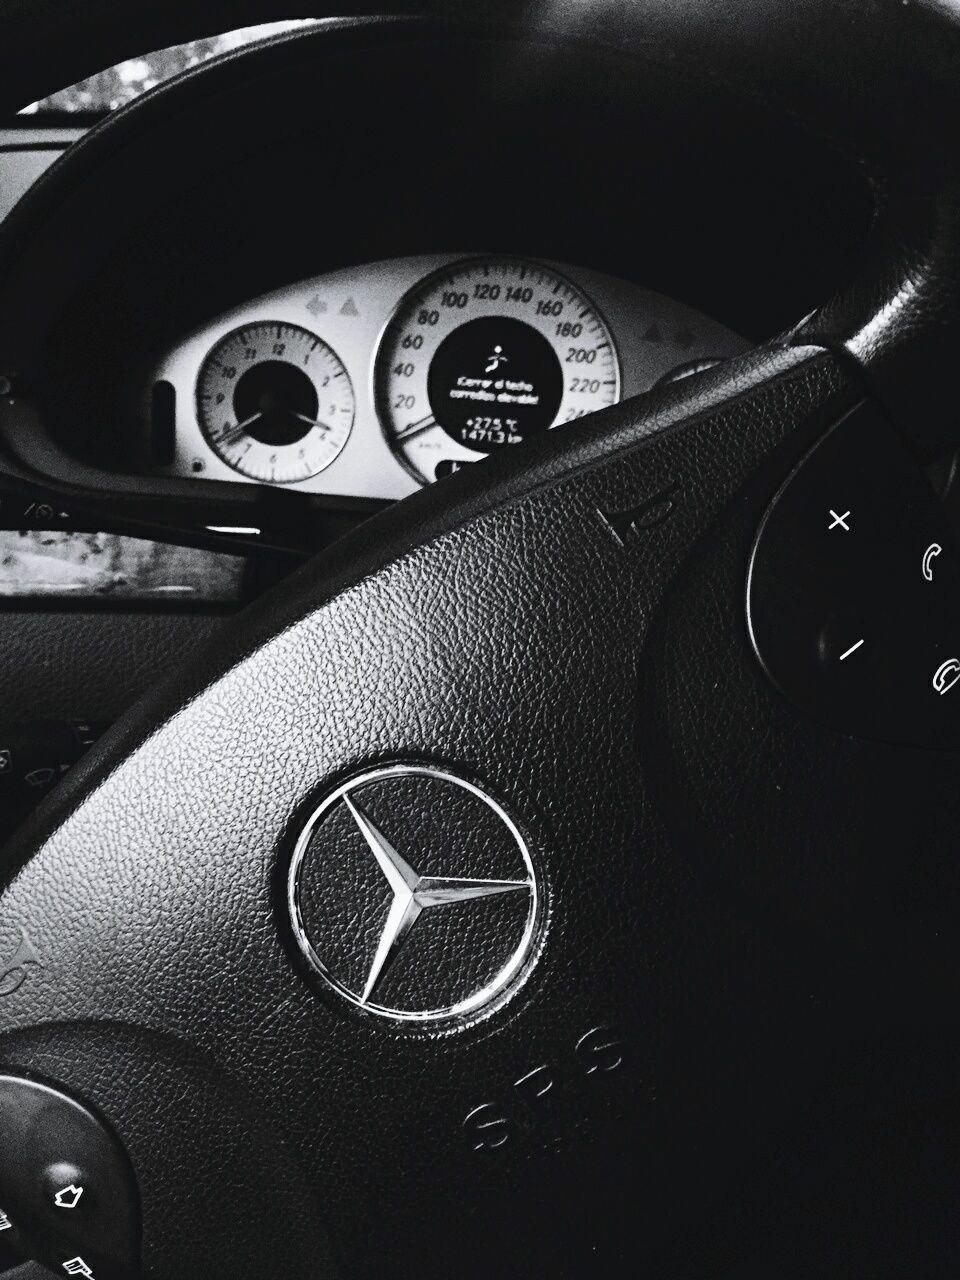 car, vehicle interior, car interior, transportation, number, mode of transport, dashboard, land vehicle, speedometer, speed, no people, communication, gauge, close-up, indoors, day